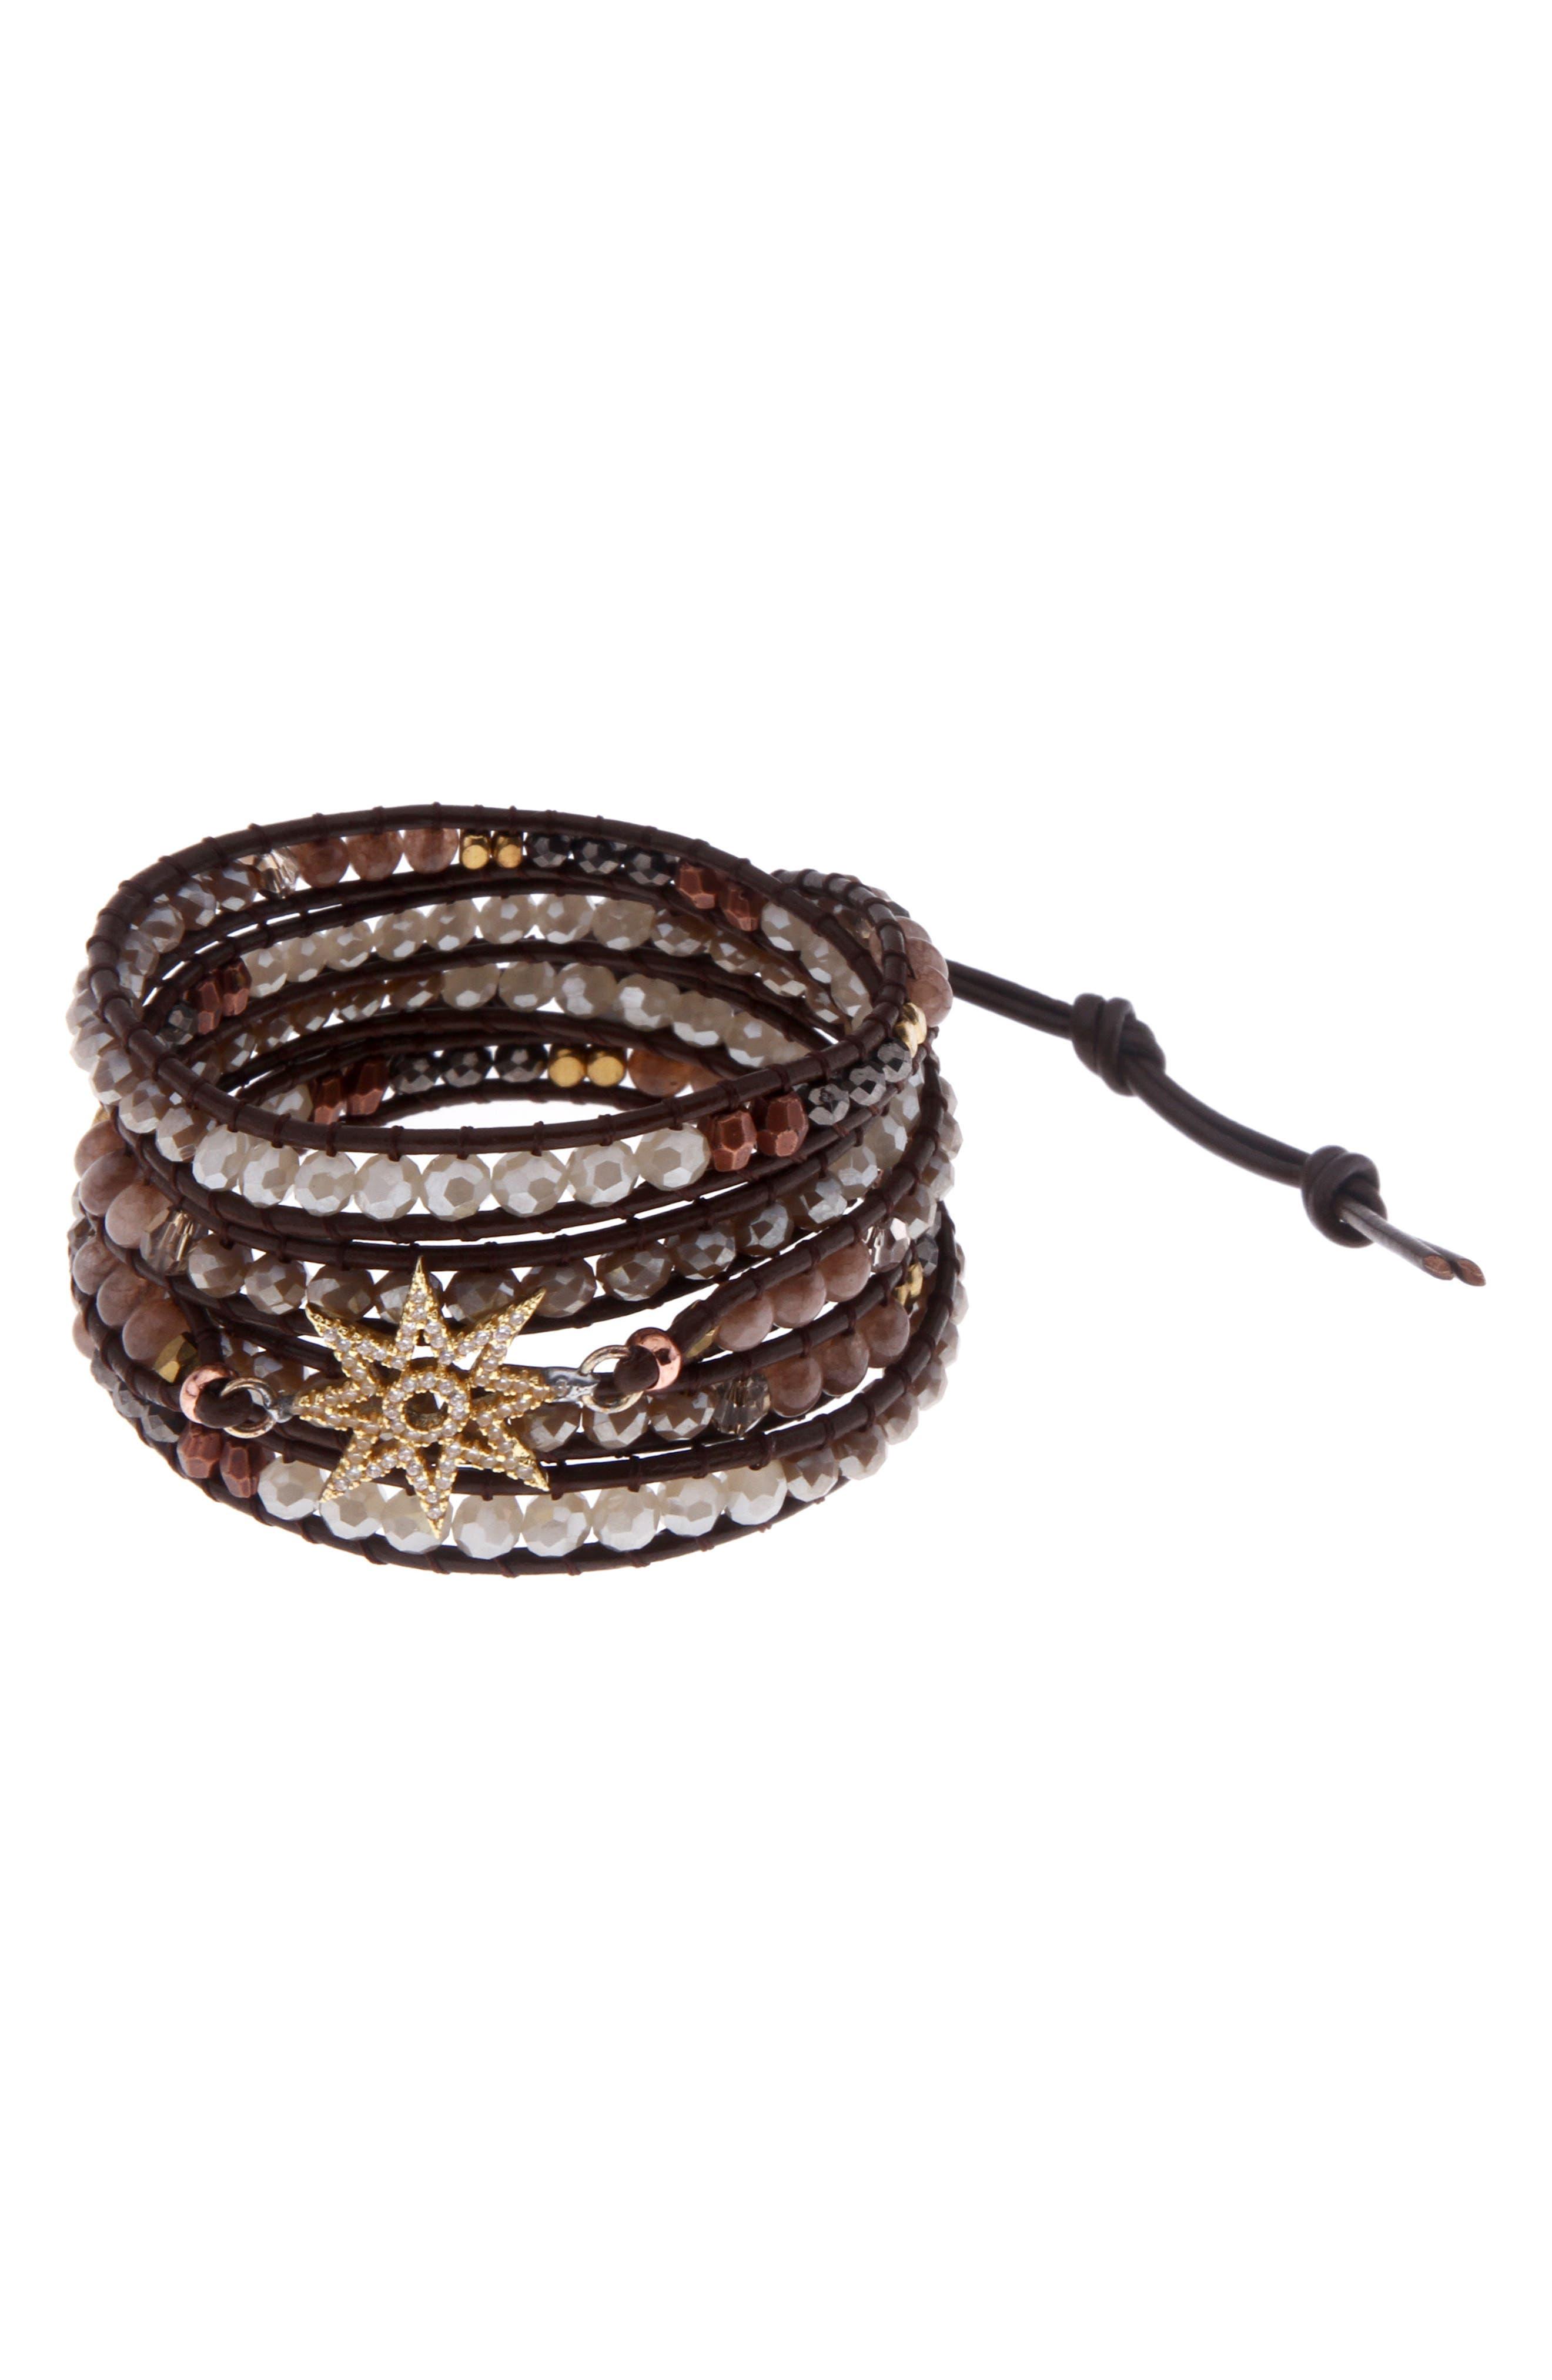 Crystal Charm Wrap Bracelet,                             Main thumbnail 1, color,                             Brown